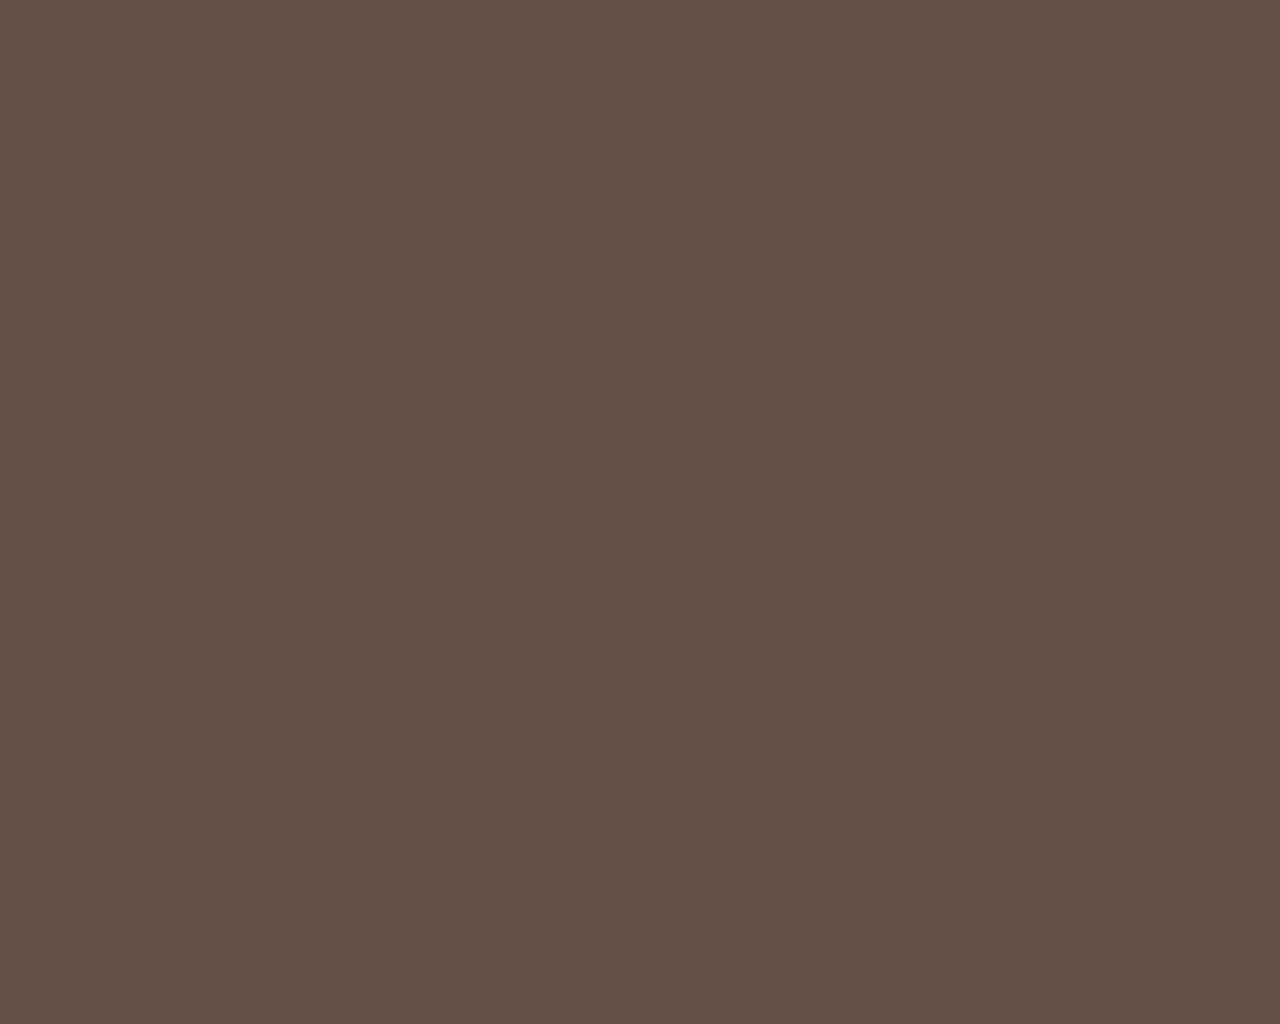 1280x1024 Umber Solid Color Background